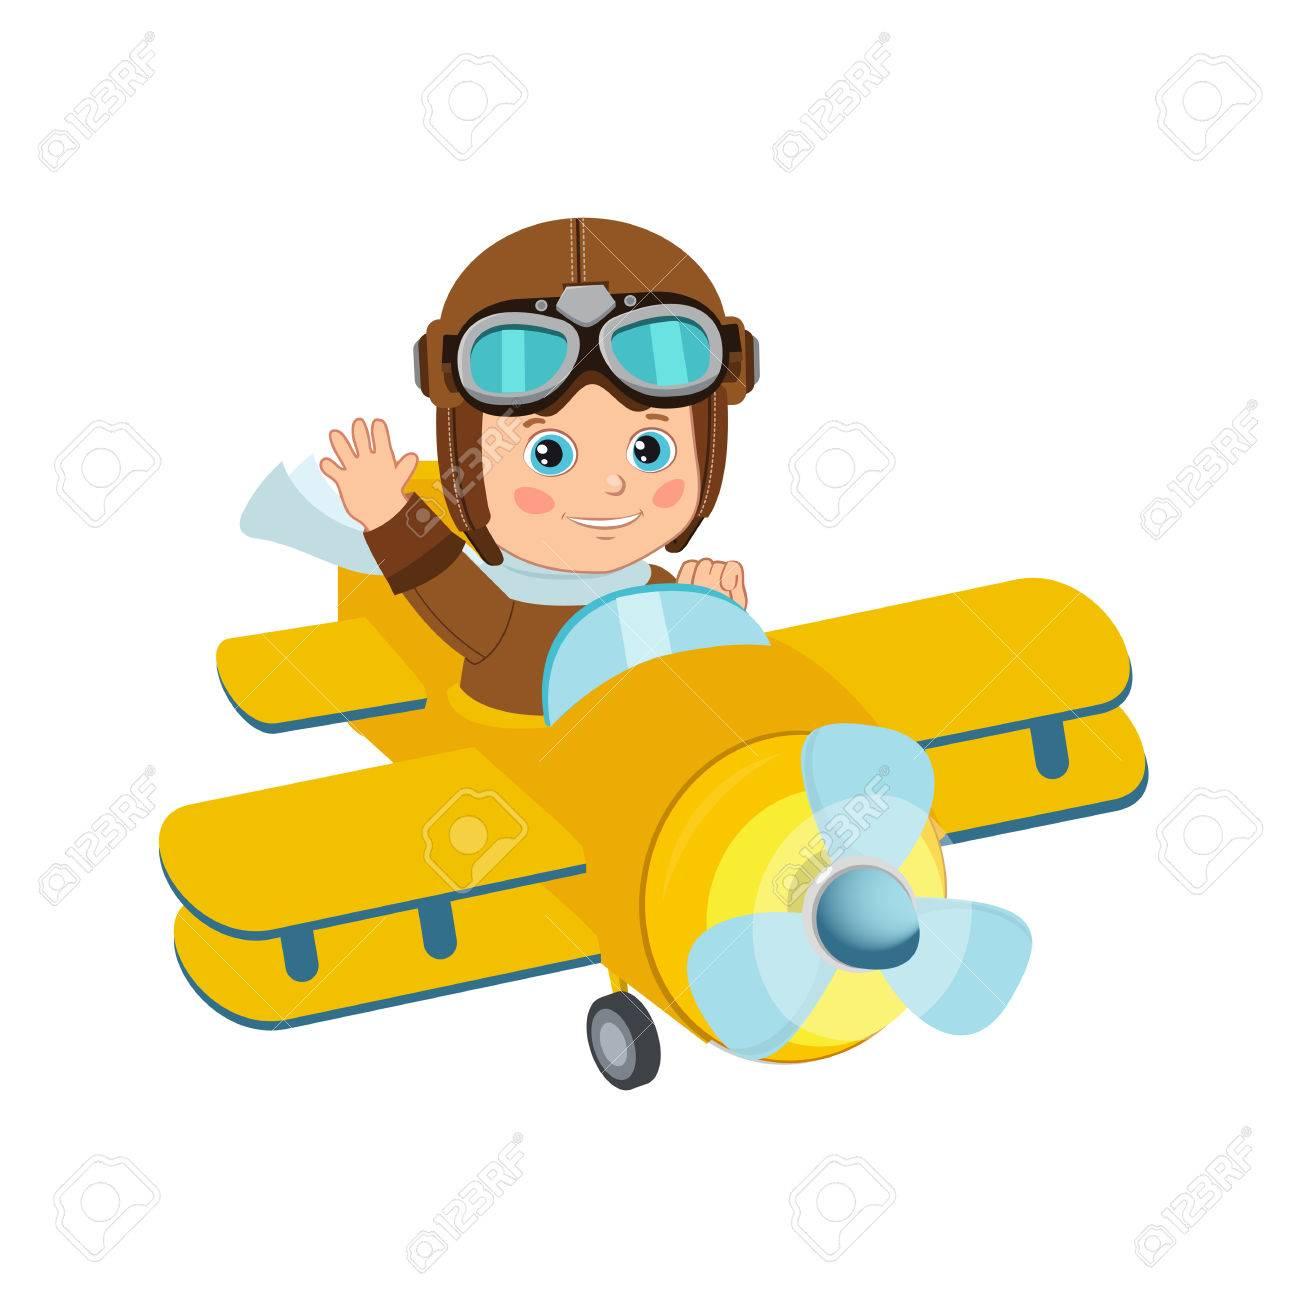 cute boy pilot flies on a airplane cartoon vector retro boy rh 123rf com airplane pilot cartoon images airplane pilot cartoon images